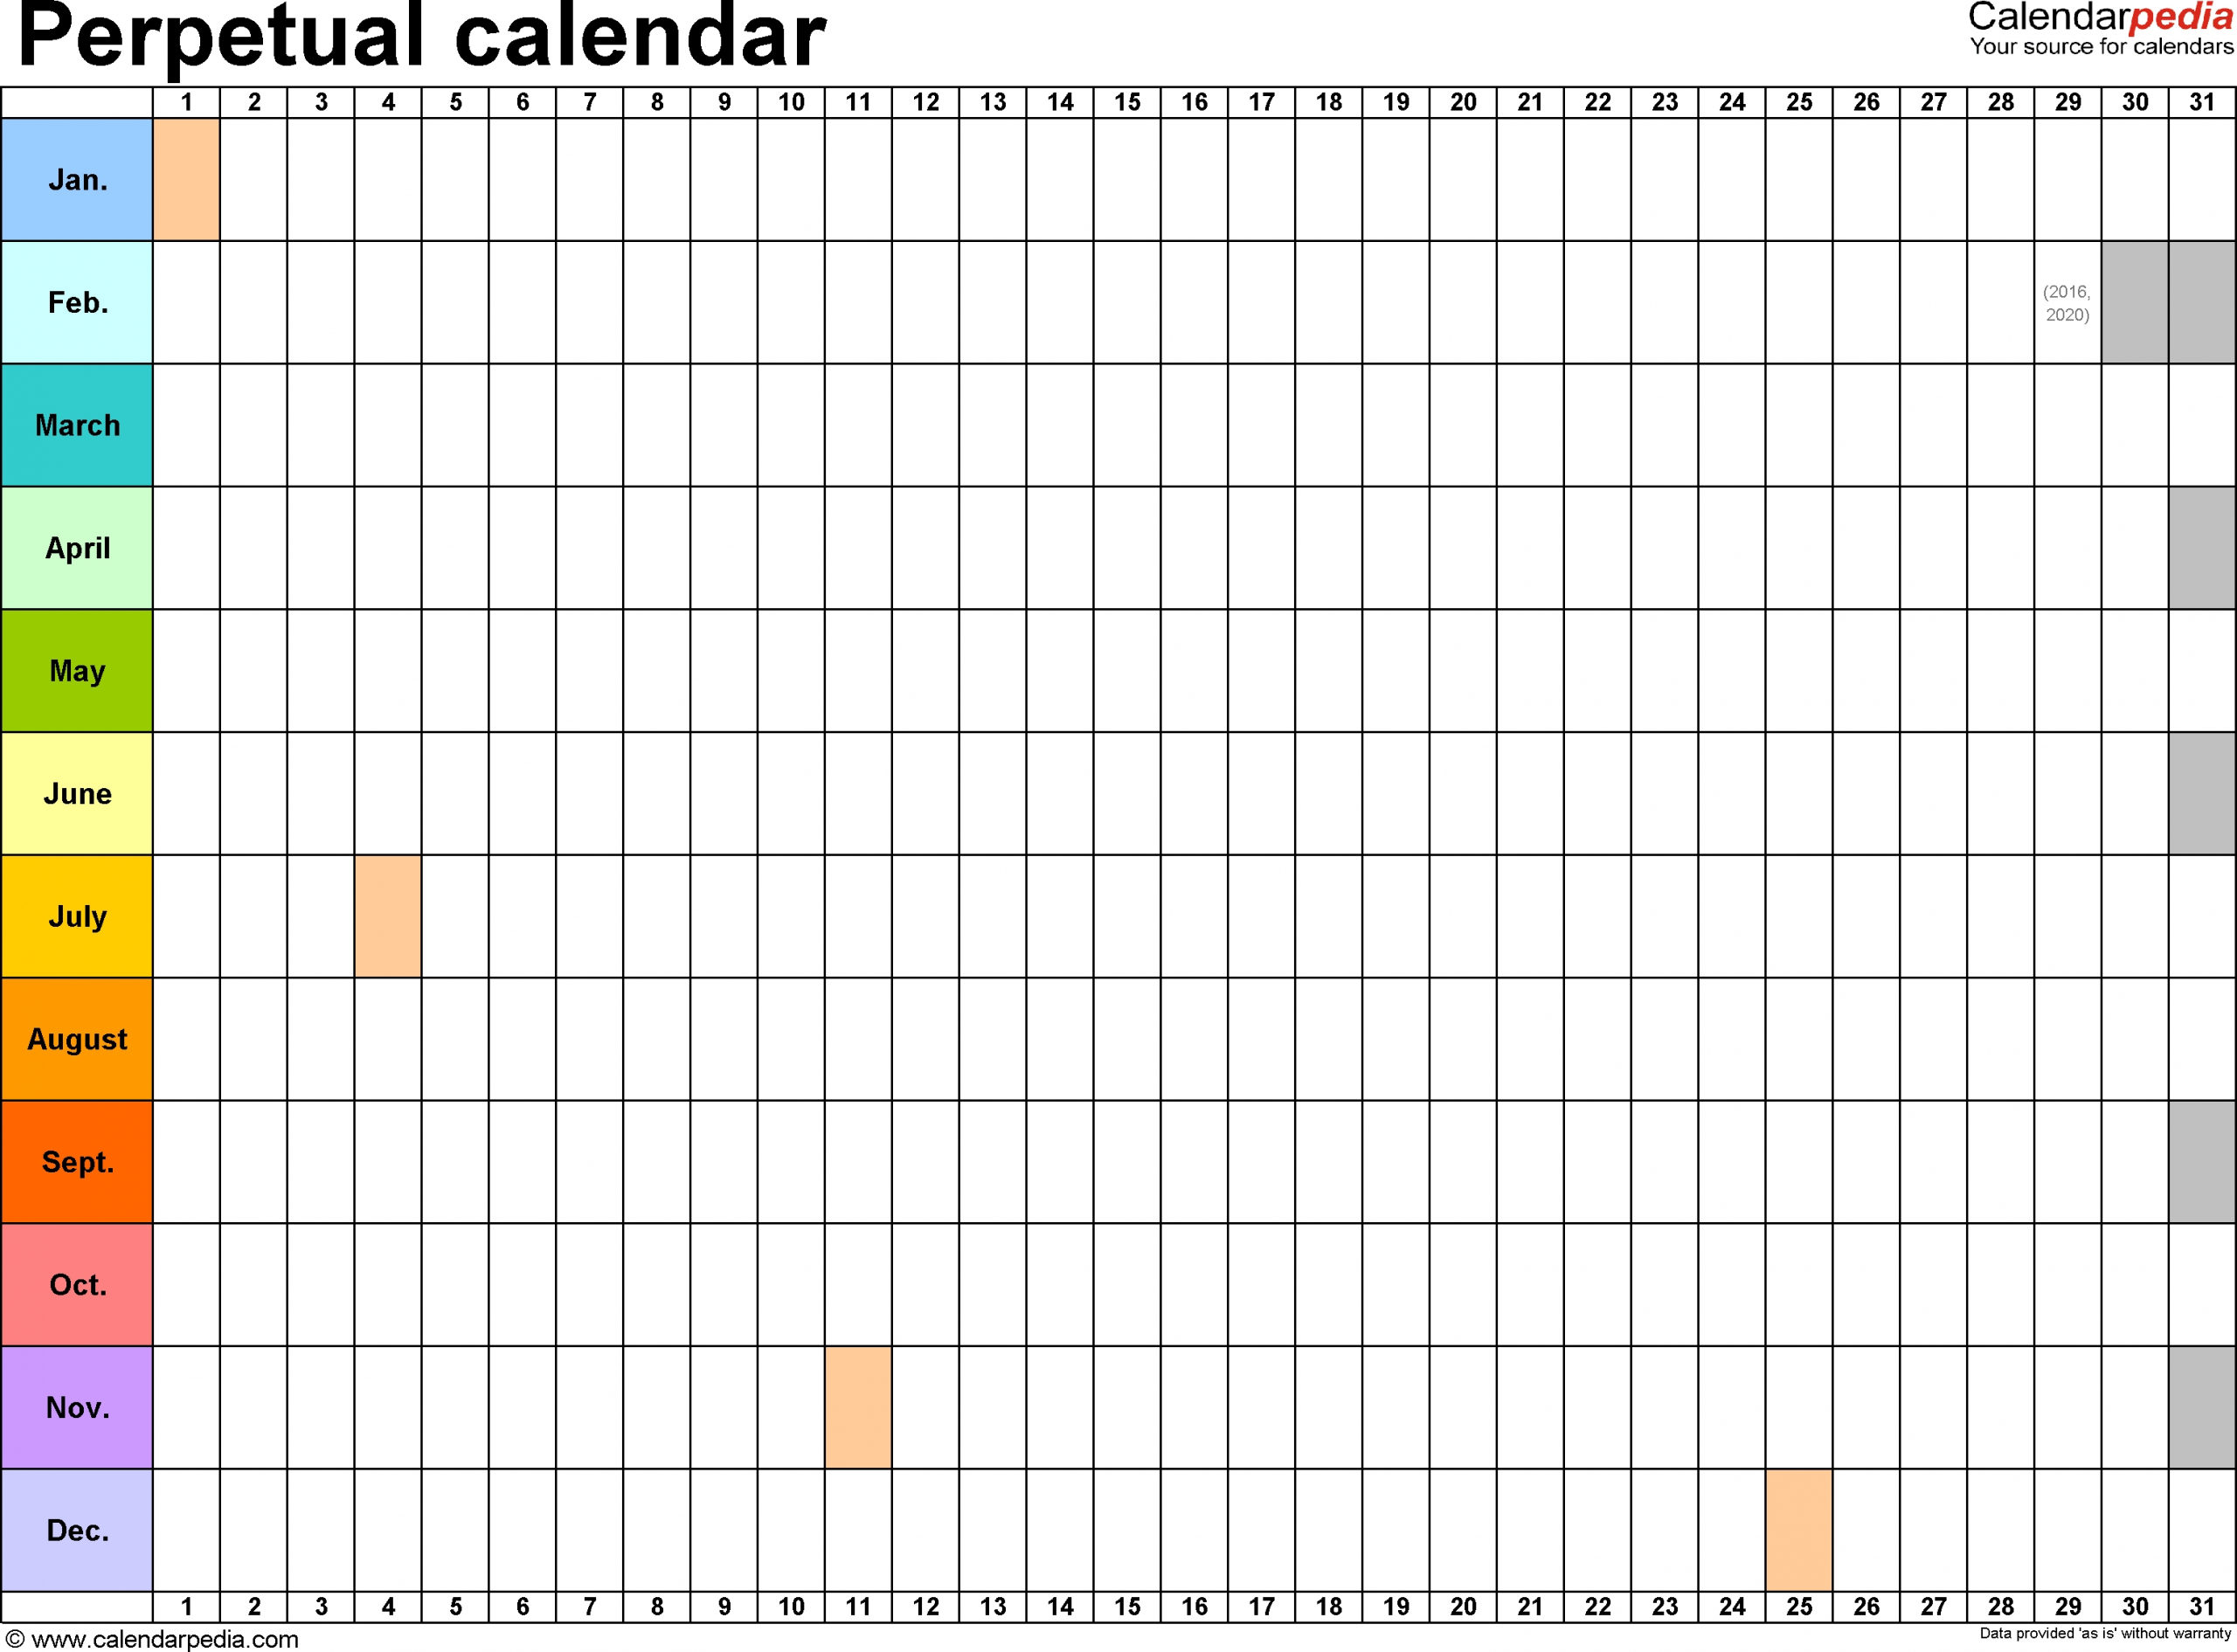 Perpetual Calendars - 7 Free Printable Word Templates  Windows 7 Word Horizontal Calendar Template